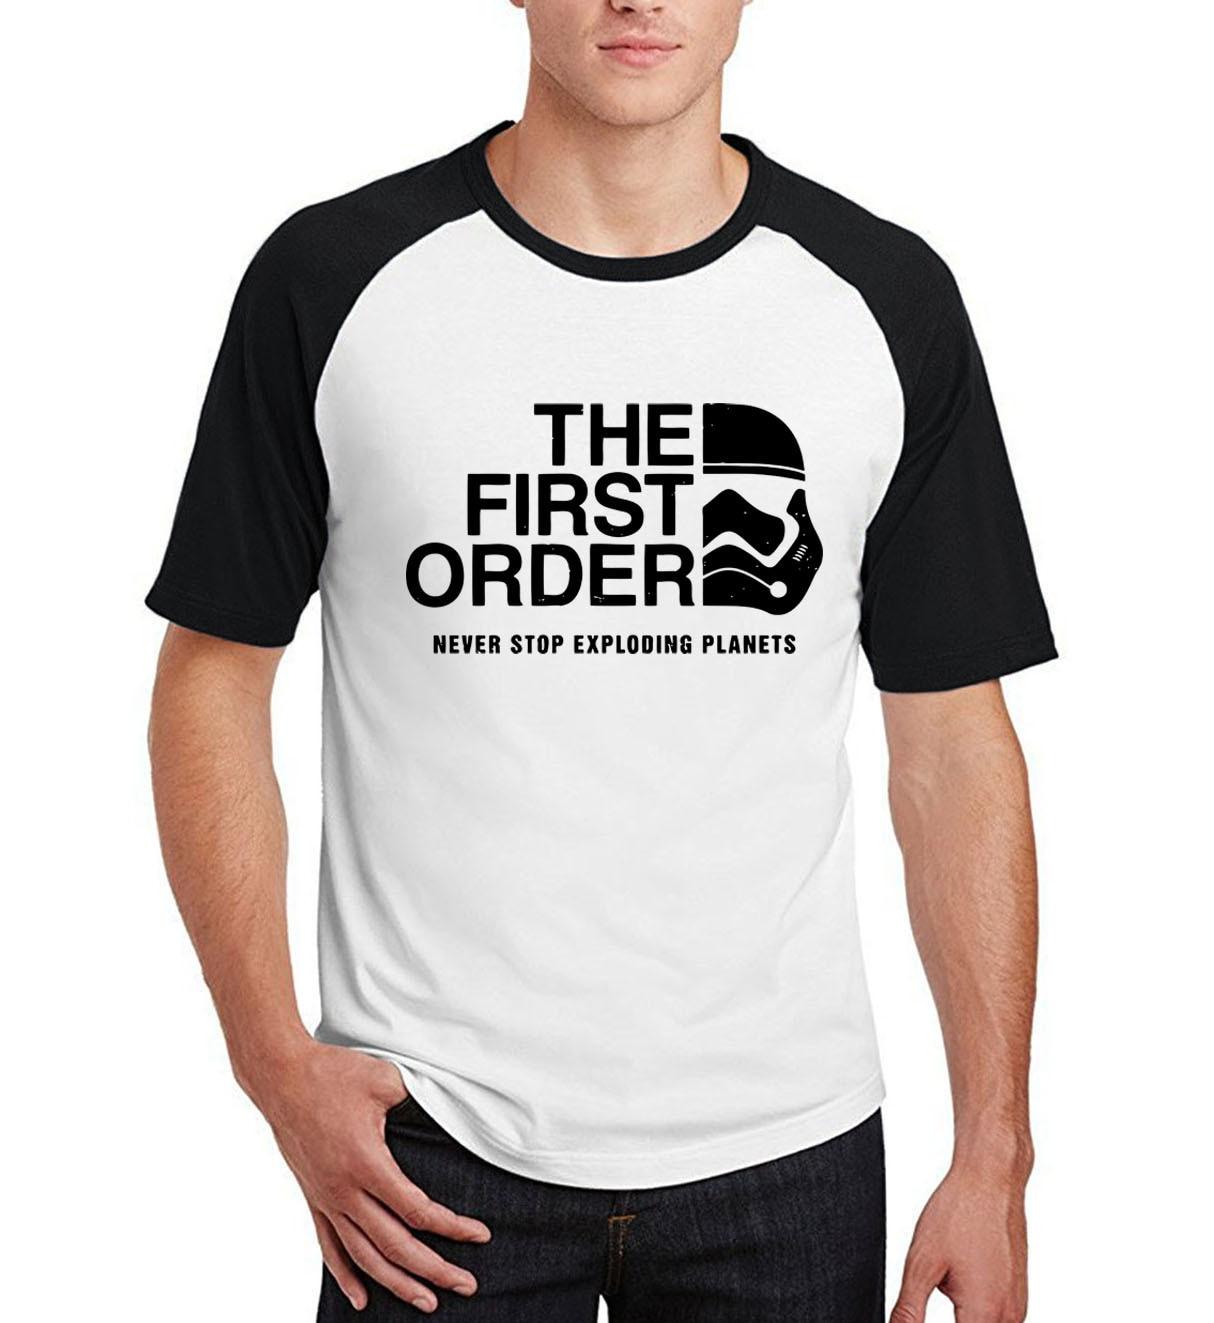 harajuku raglan short sleeve t-shirt for men never stop exploding planets 2019 summer bodybuilding camiseta the first order tops